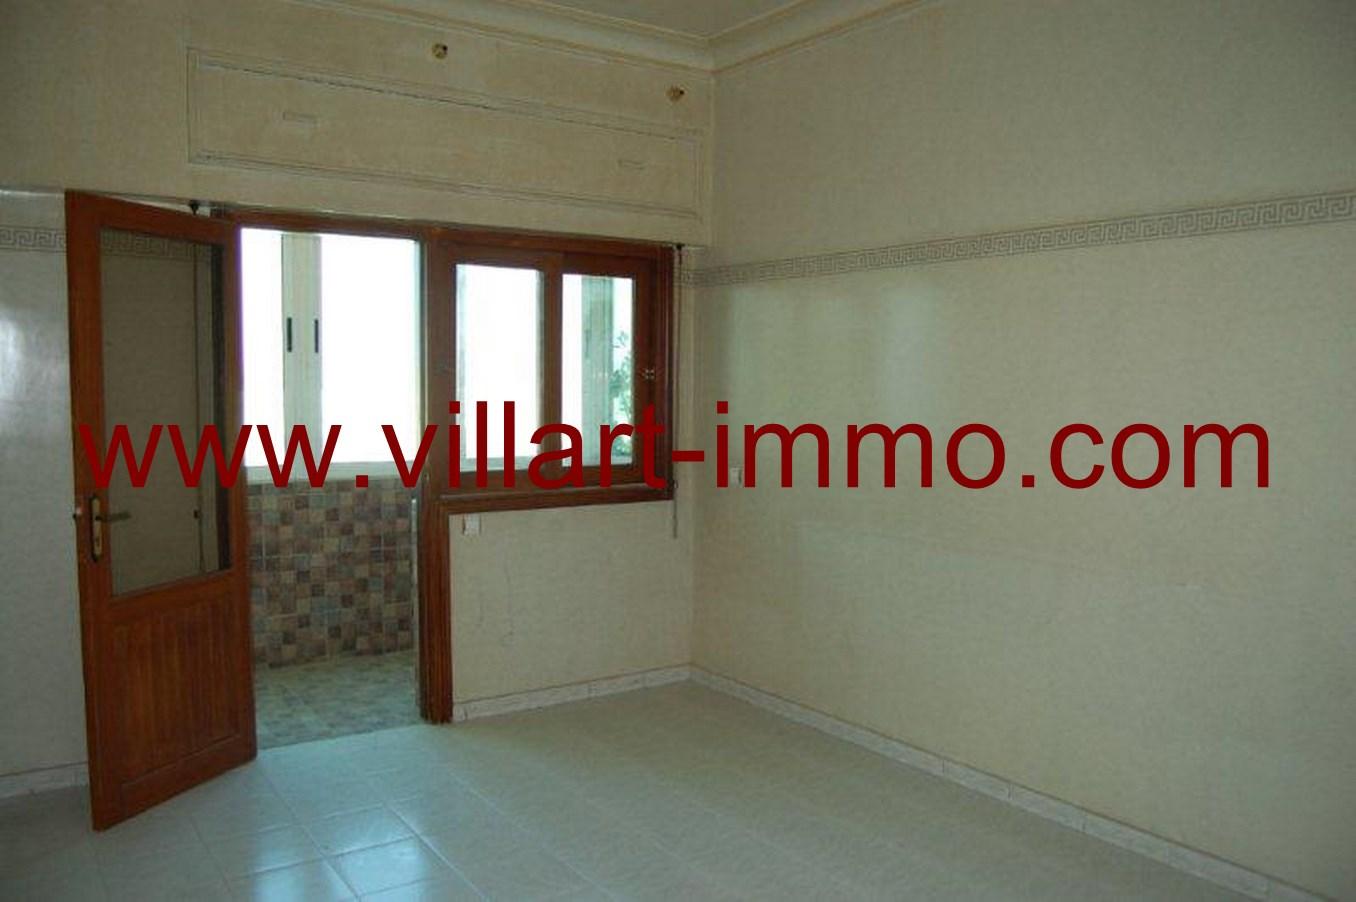 4-Location-Appartement-Non meublé-Tanger-Chambre 1-L662-Villart immo